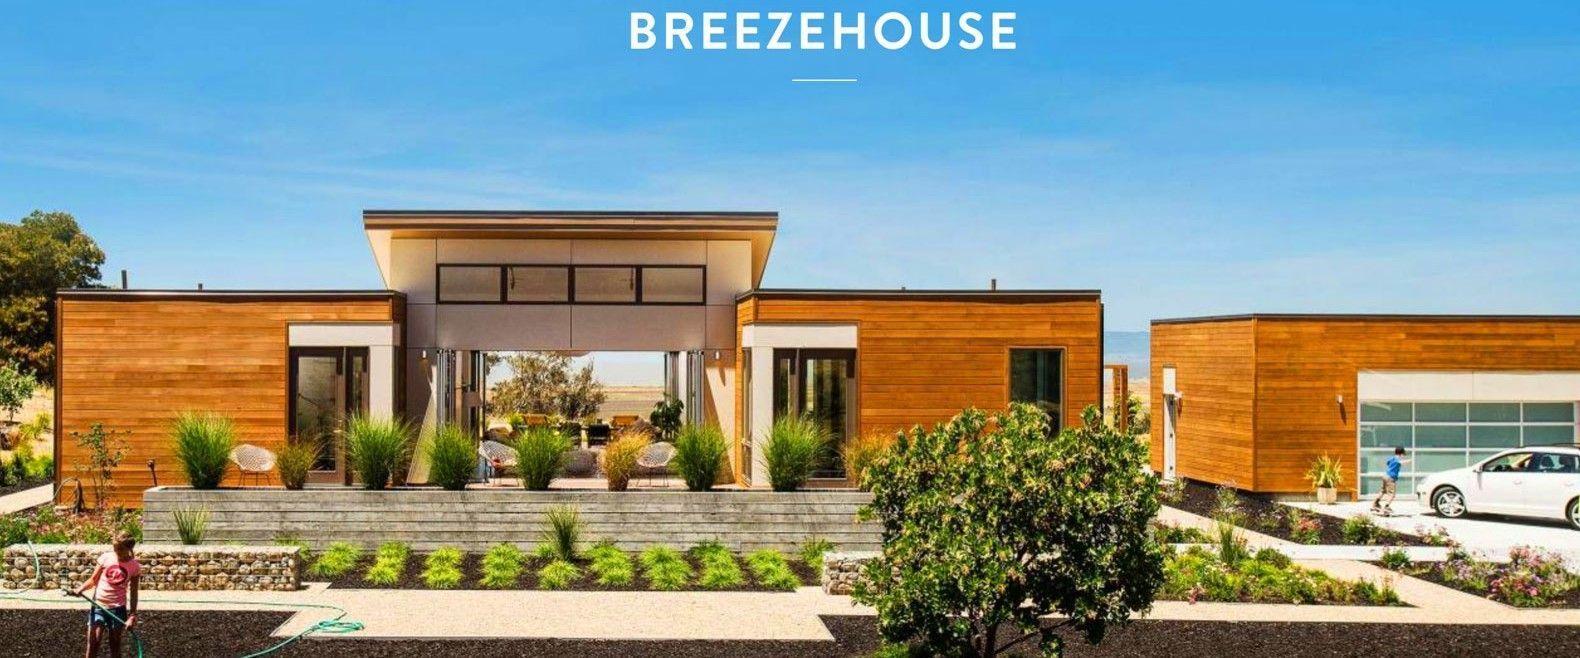 Affordable Green Home - 73228c97138d697bd948323aacec6a80_Top Affordable Green Home - 73228c97138d697bd948323aacec6a80  Gallery_472324.jpg